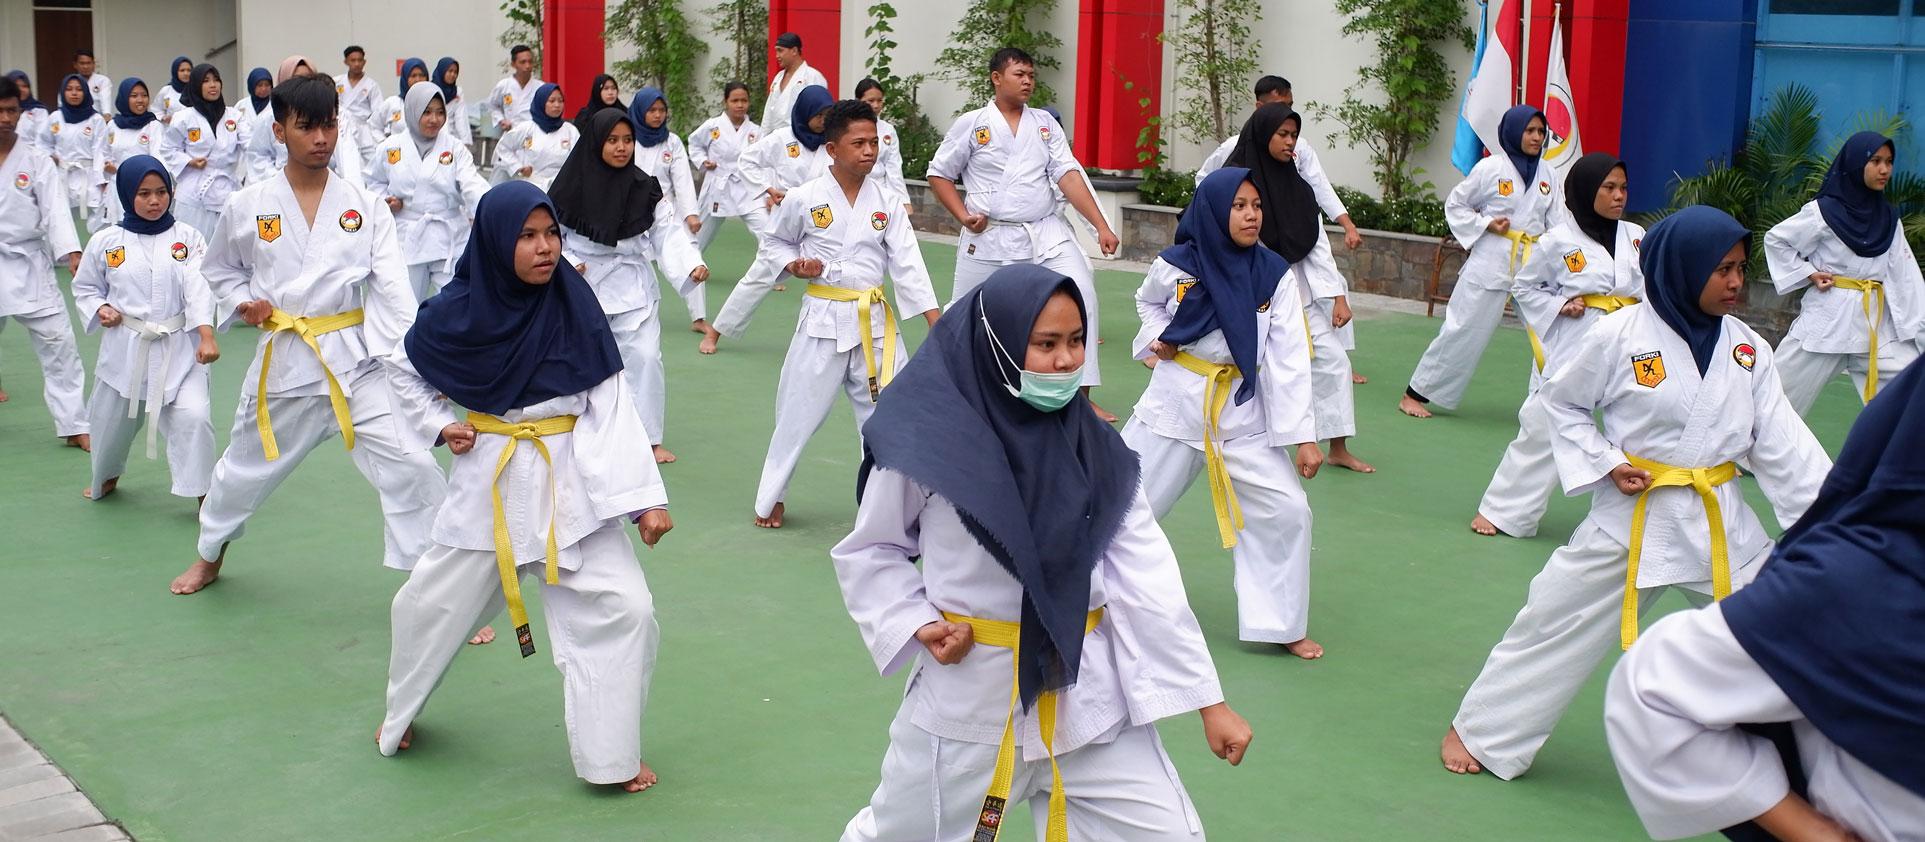 karate akbara